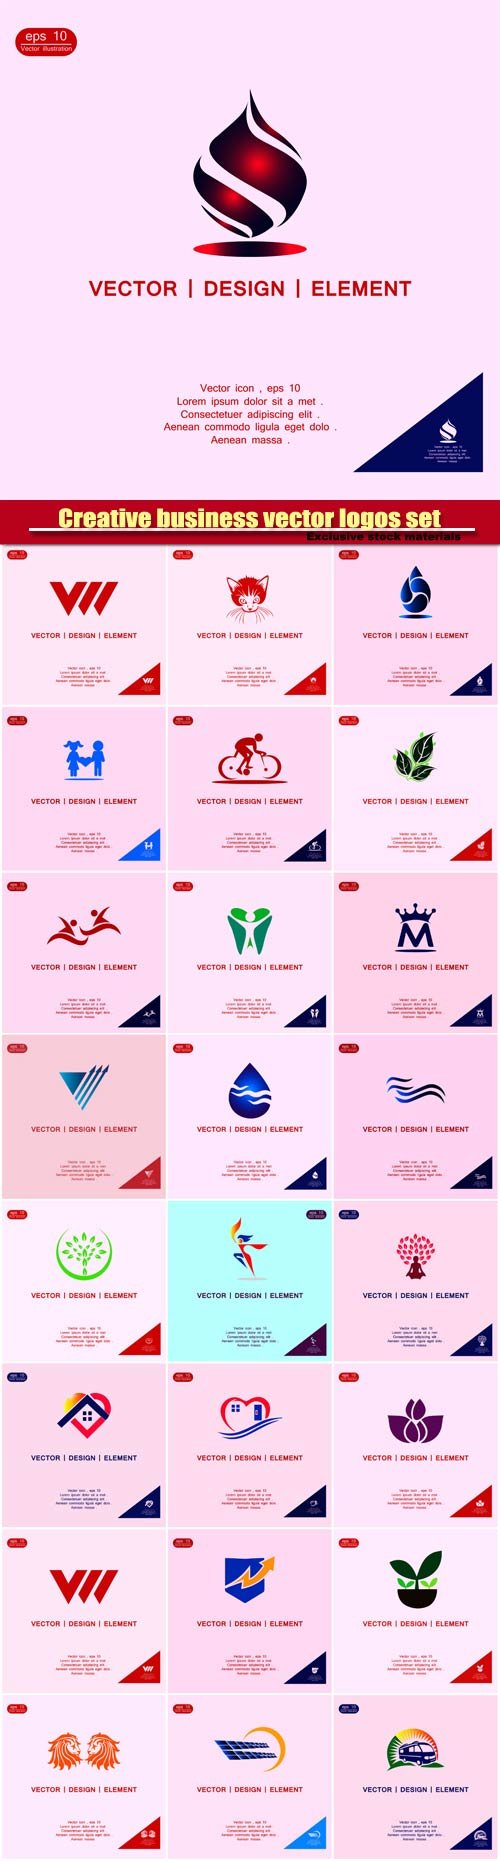 Creative business vector logos set templates